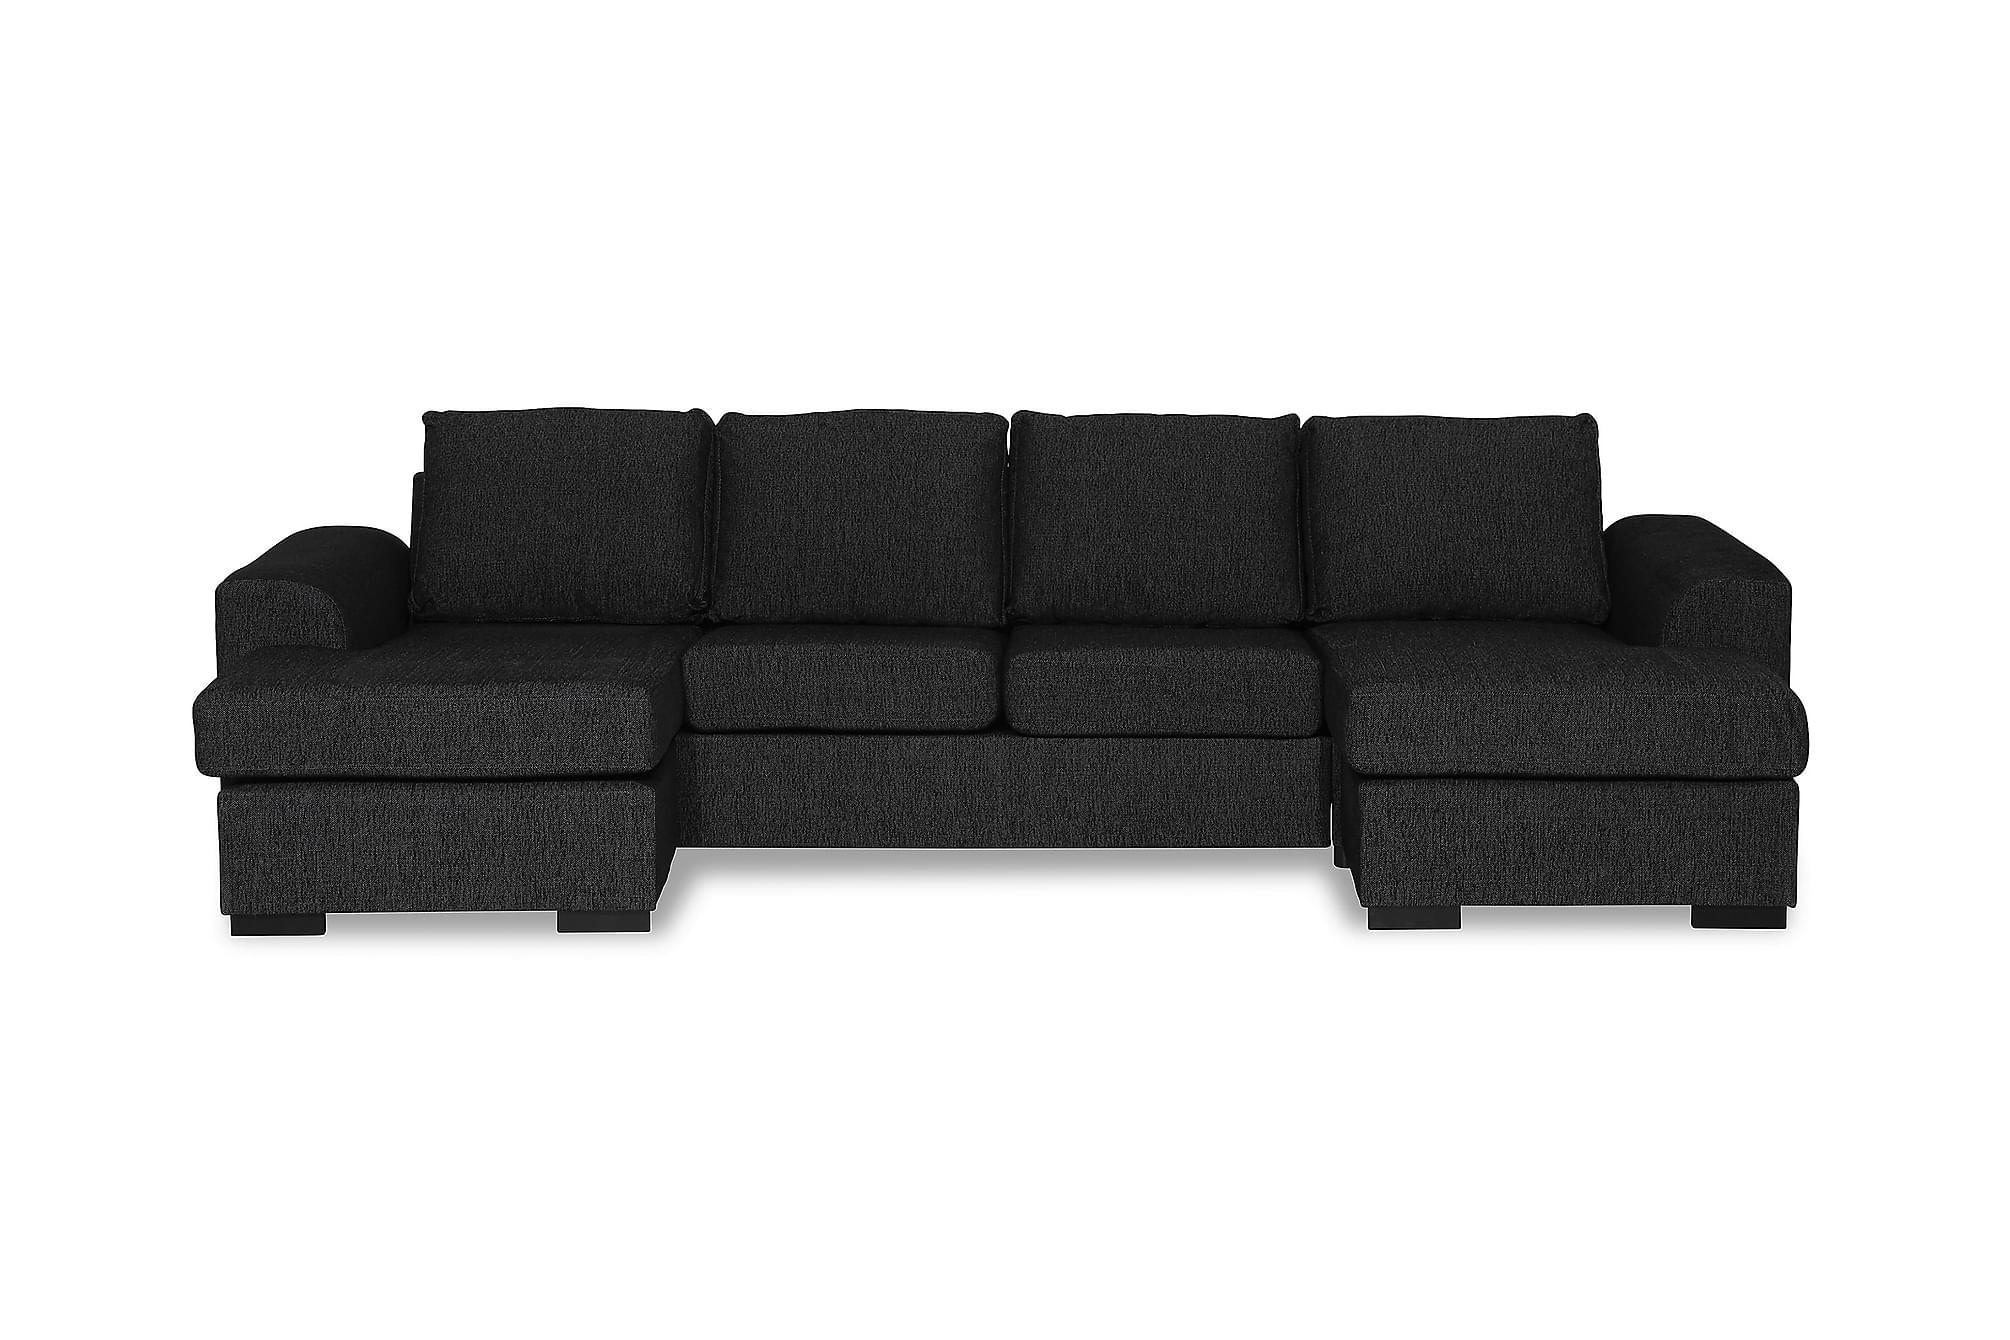 NASHVILLE U-soffa Dubbeldivan Svart